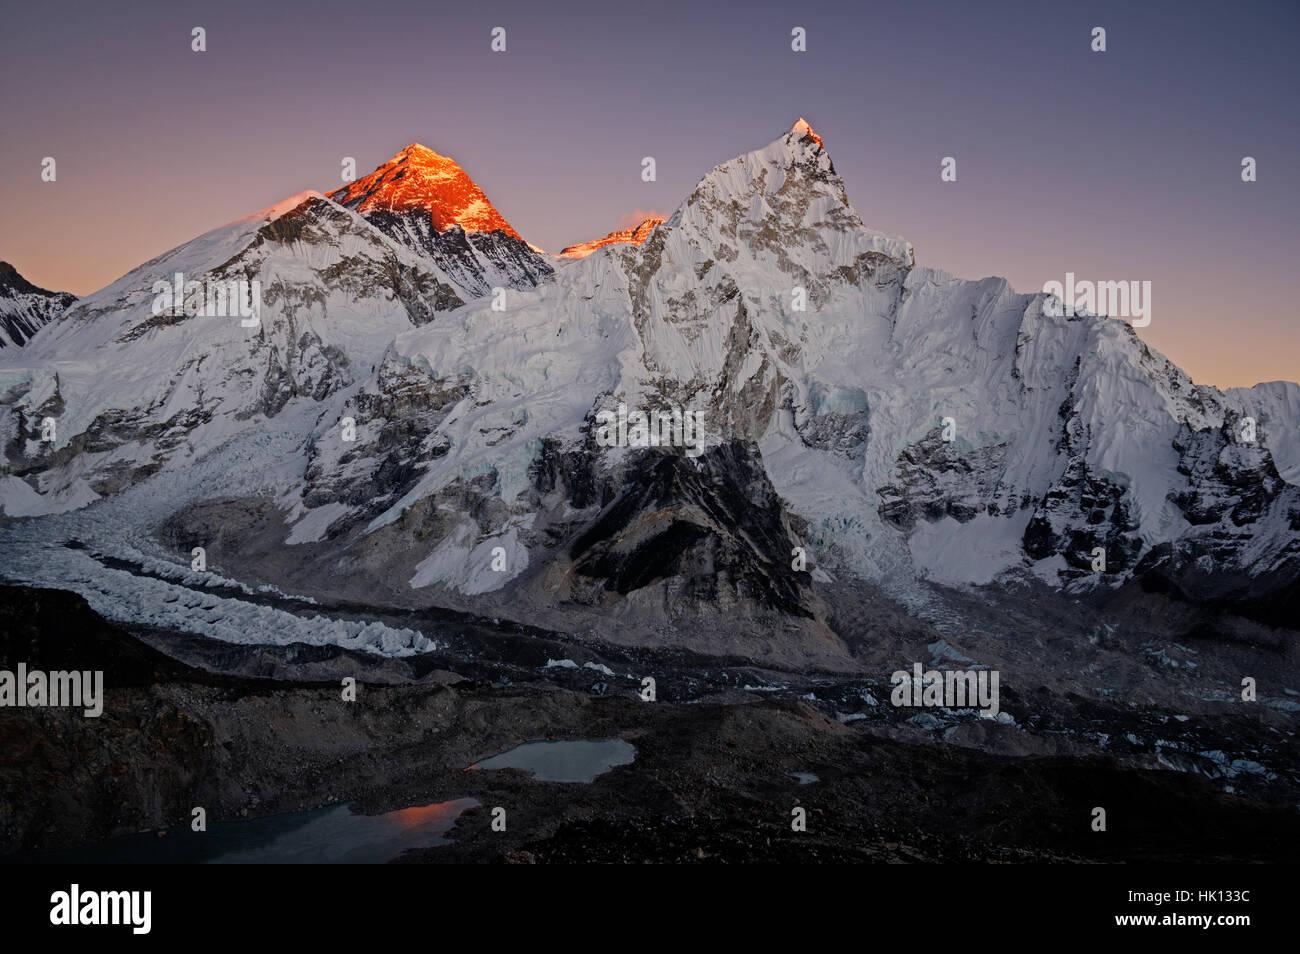 last light hitting the highest peaks of Everest, Lhotse, and Nuptse in Nepal from Kala Patthar - Stock Image